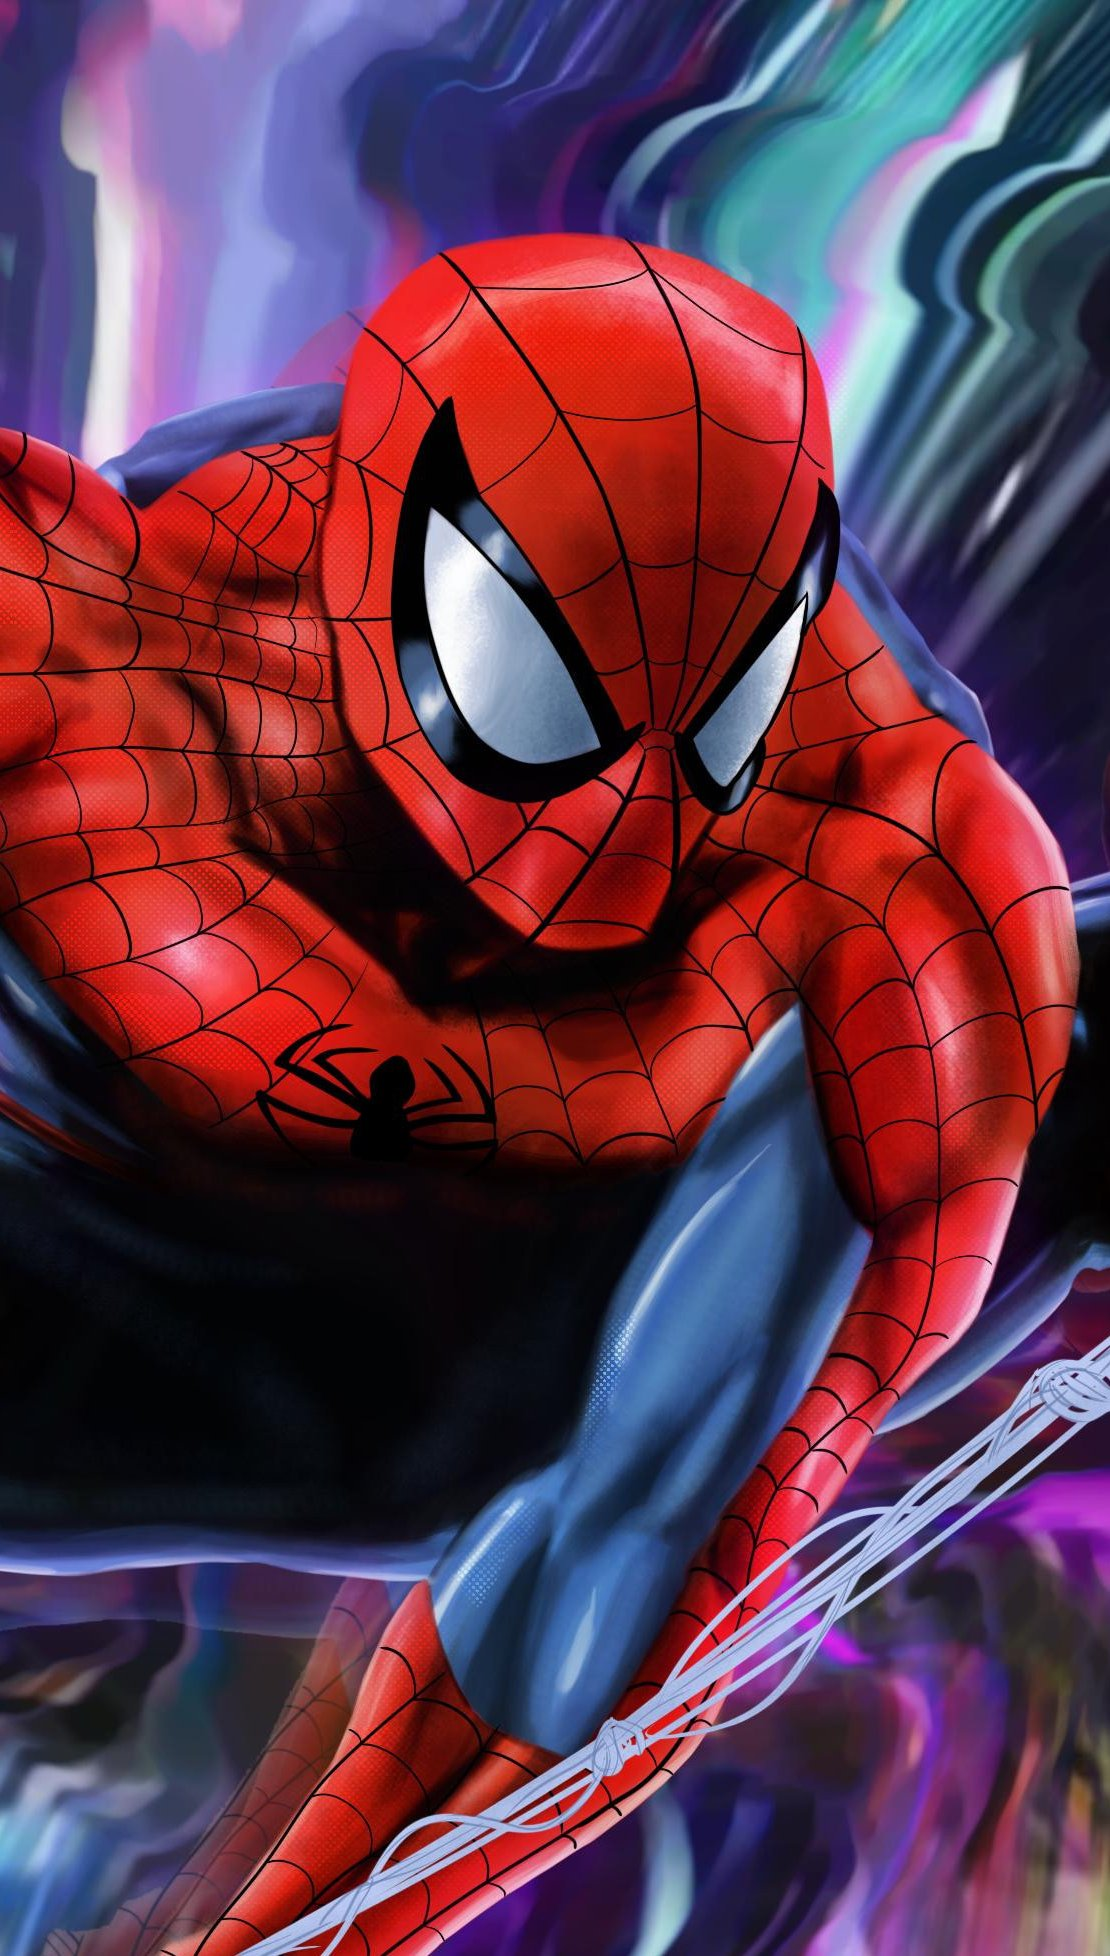 Fondos de pantalla El hombre araña con fondo colorido Vertical